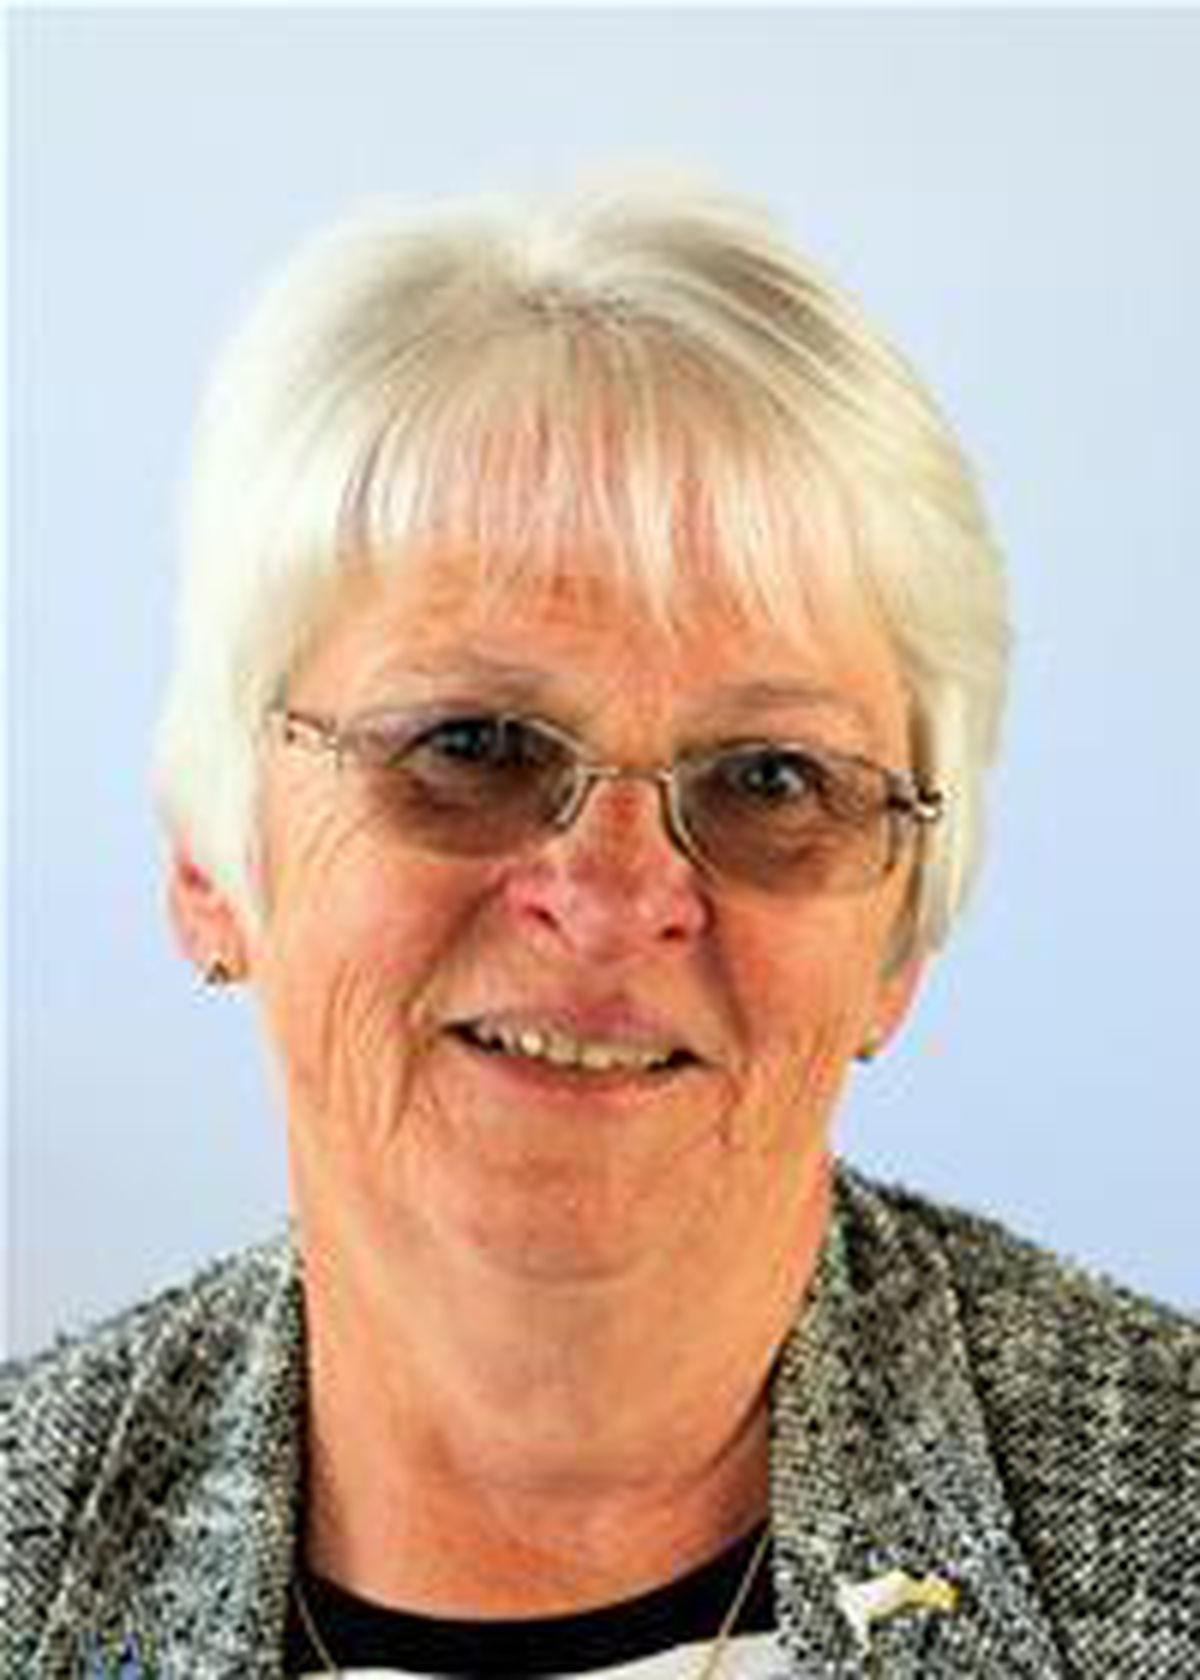 Councillor Kath Roberts-Jones has concerns about the plans